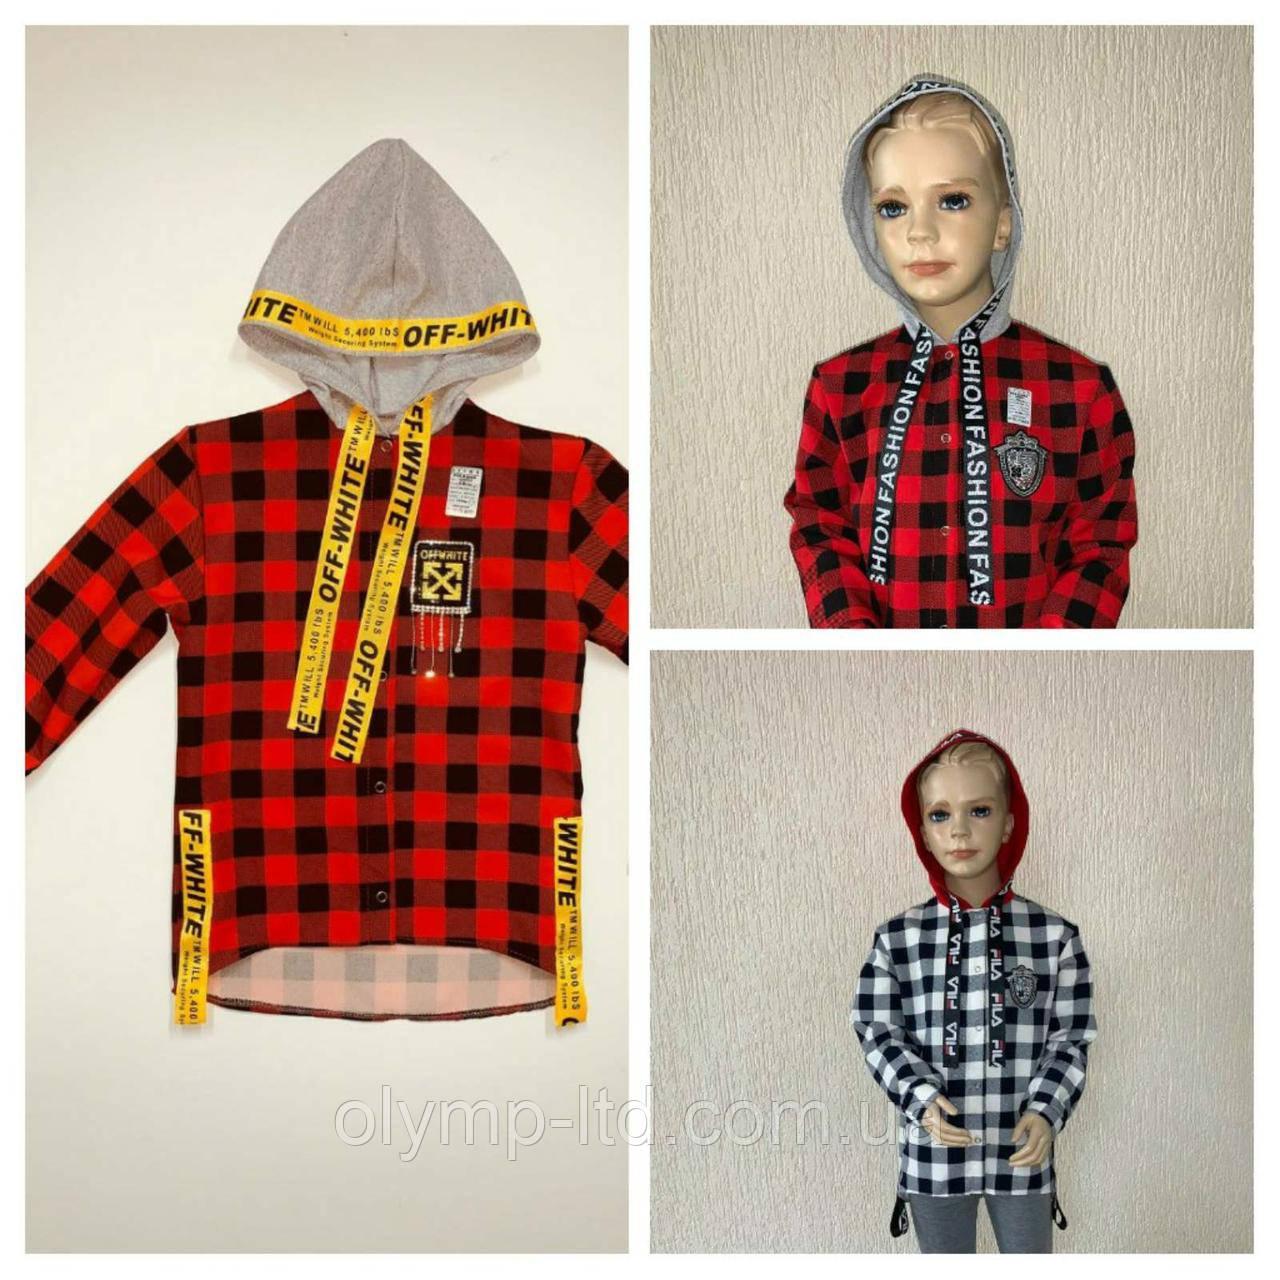 Рубашка для девочки подростка 34-42 р-р костюмка капюшон нашивка ленты кнопки.